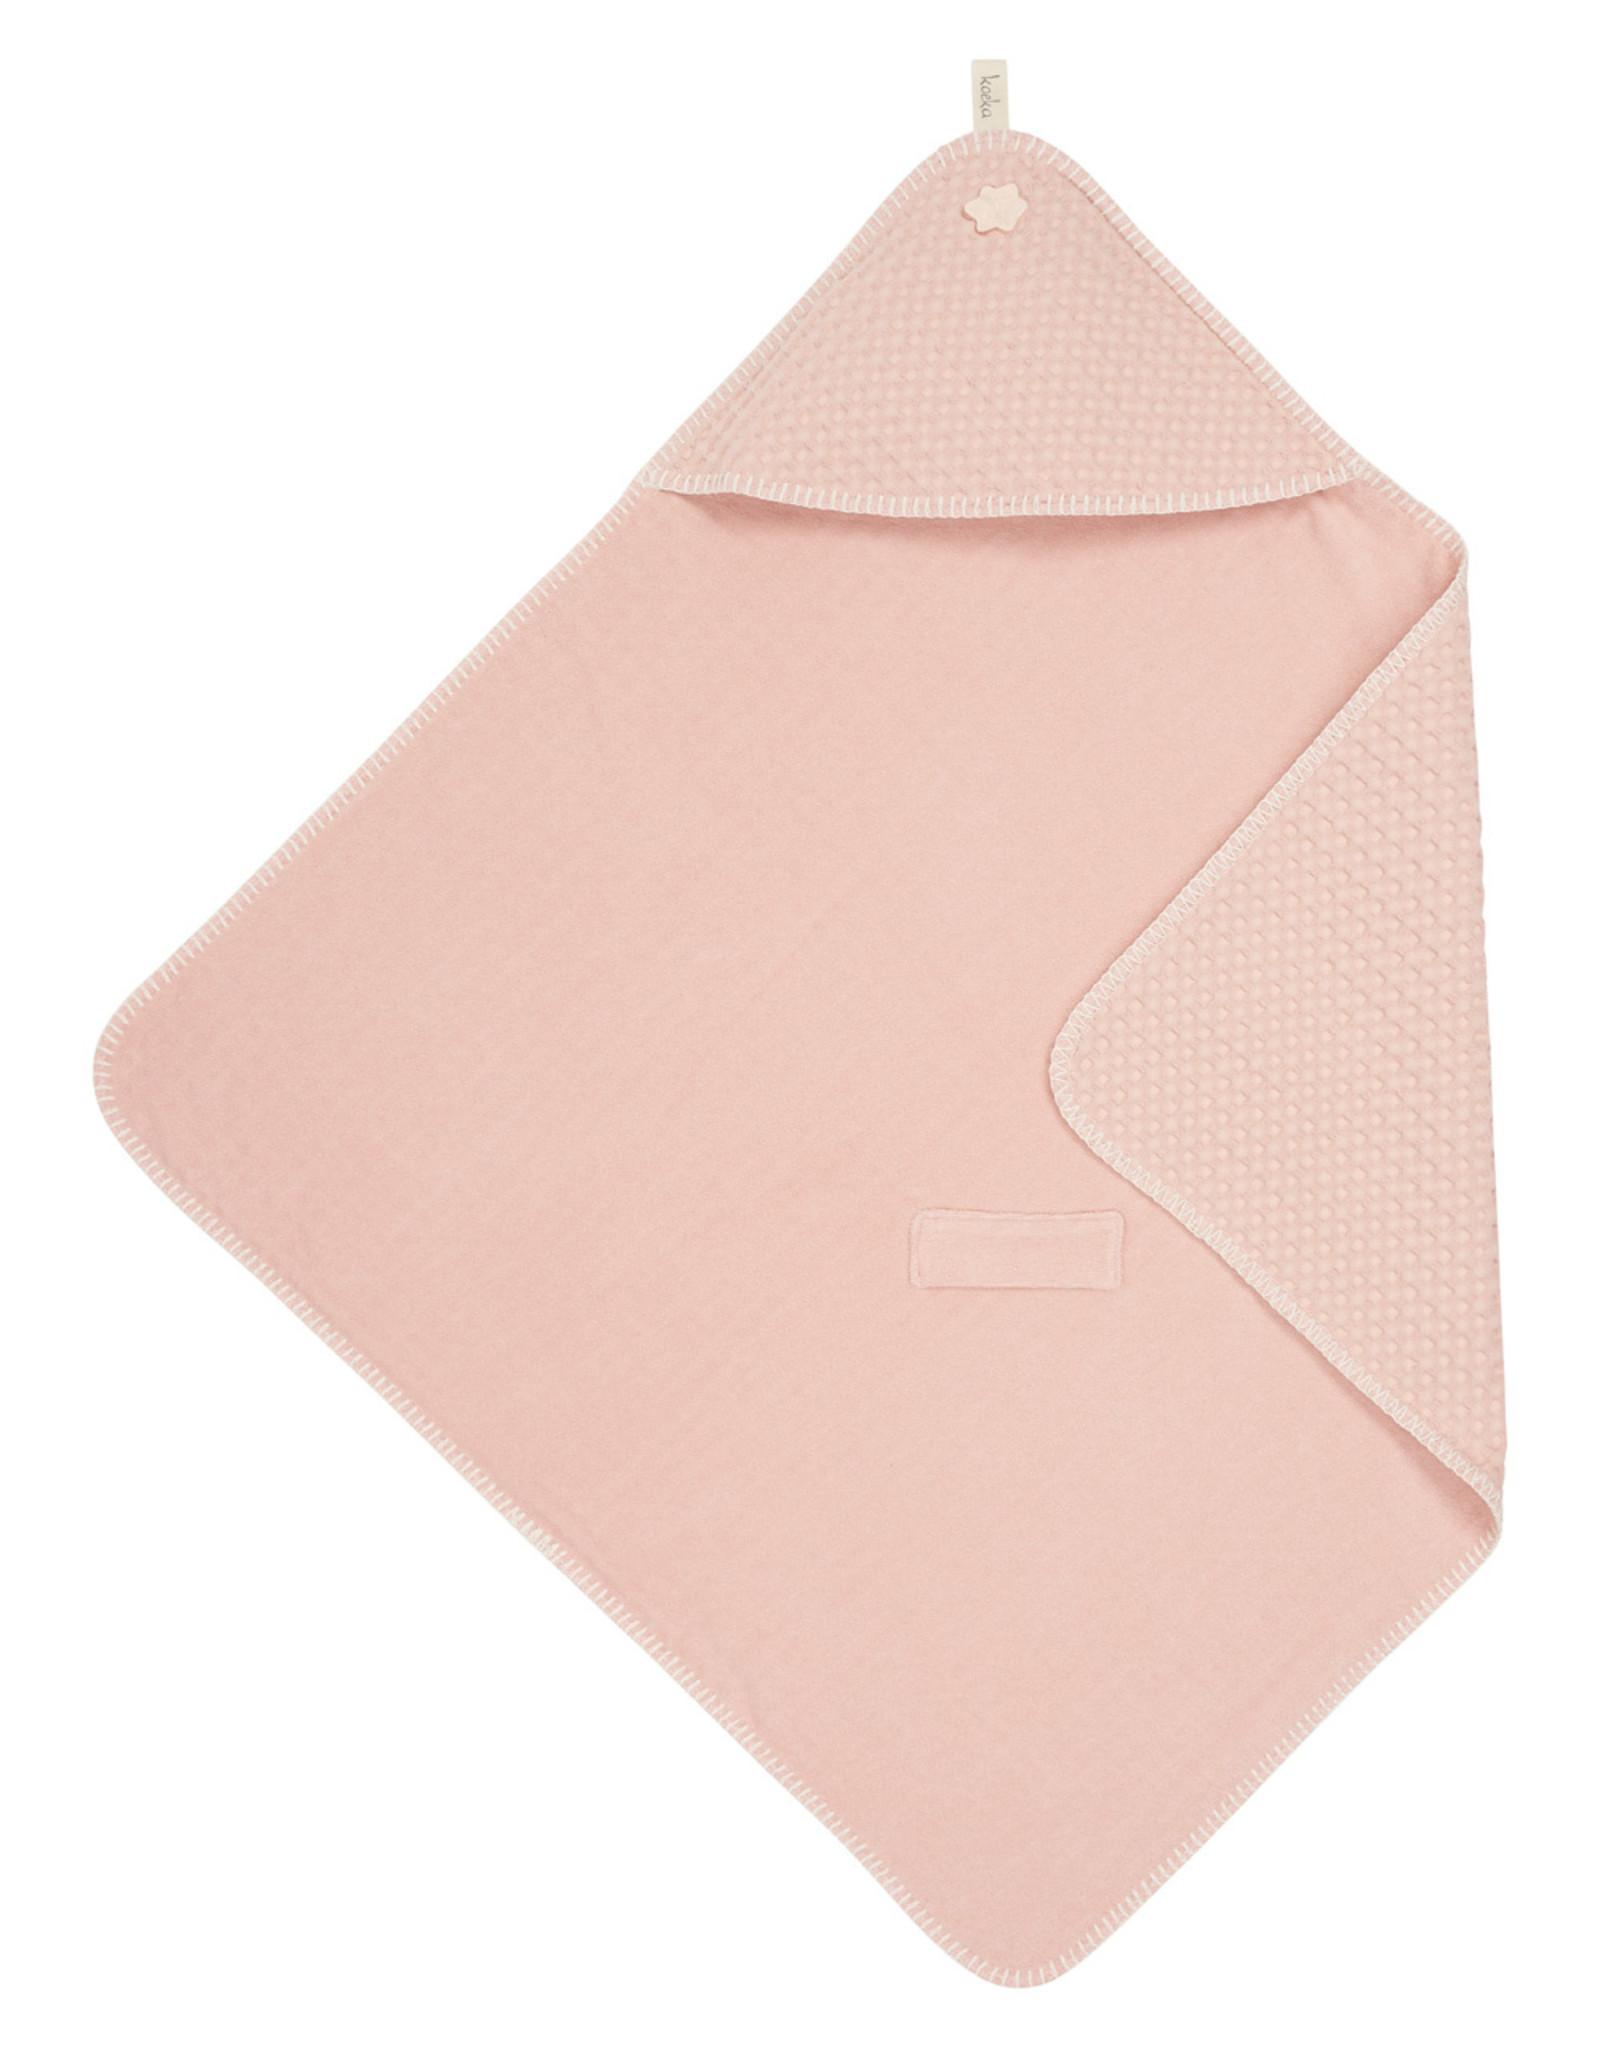 Koeka Koeka Omslagdoek Antwerp Wafel Shadow Pink